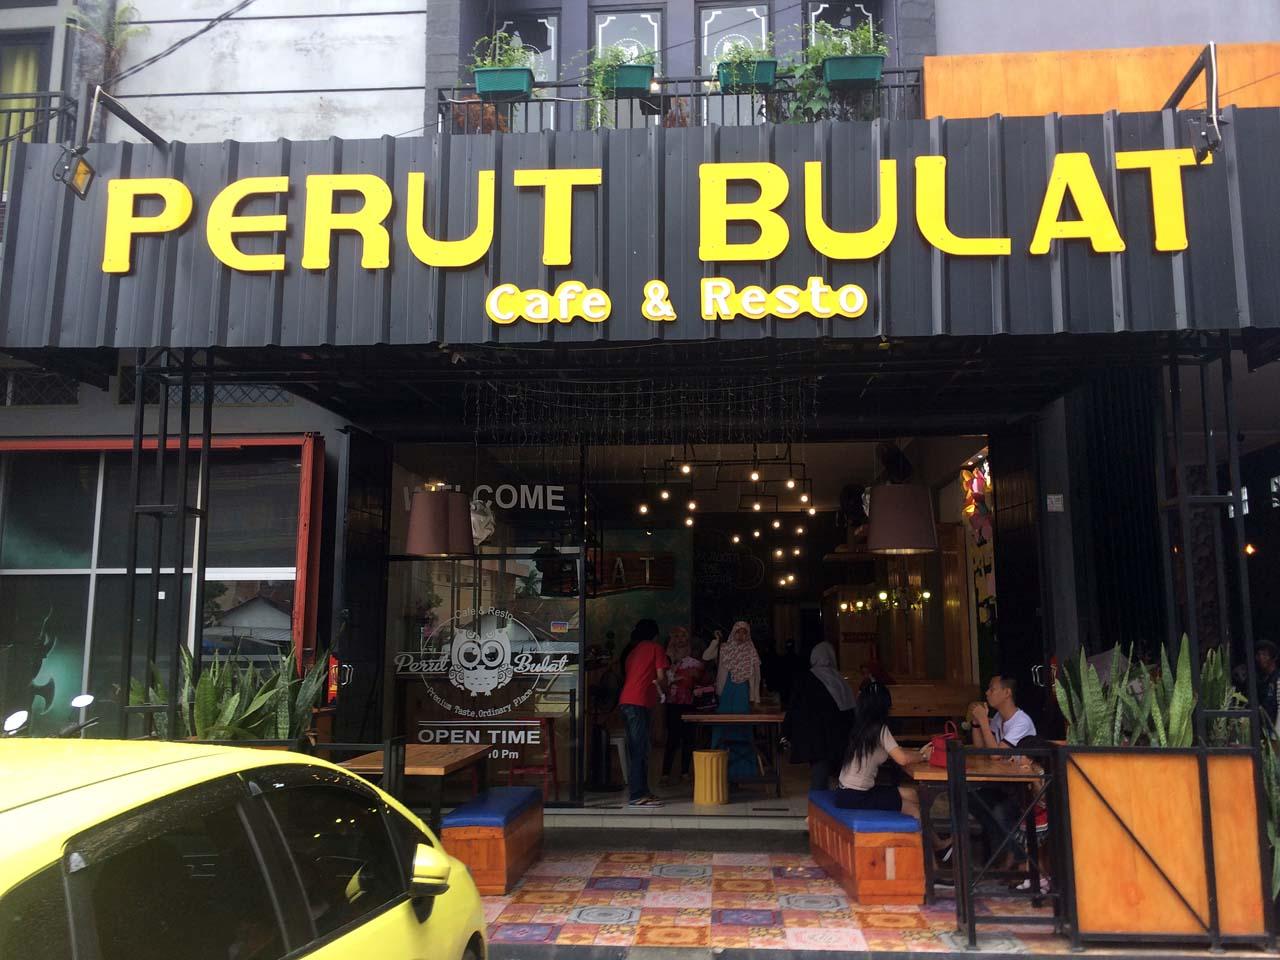 5 - iphone 52 - Perut Bulat Cafe & Resto - Yopie Pangkey